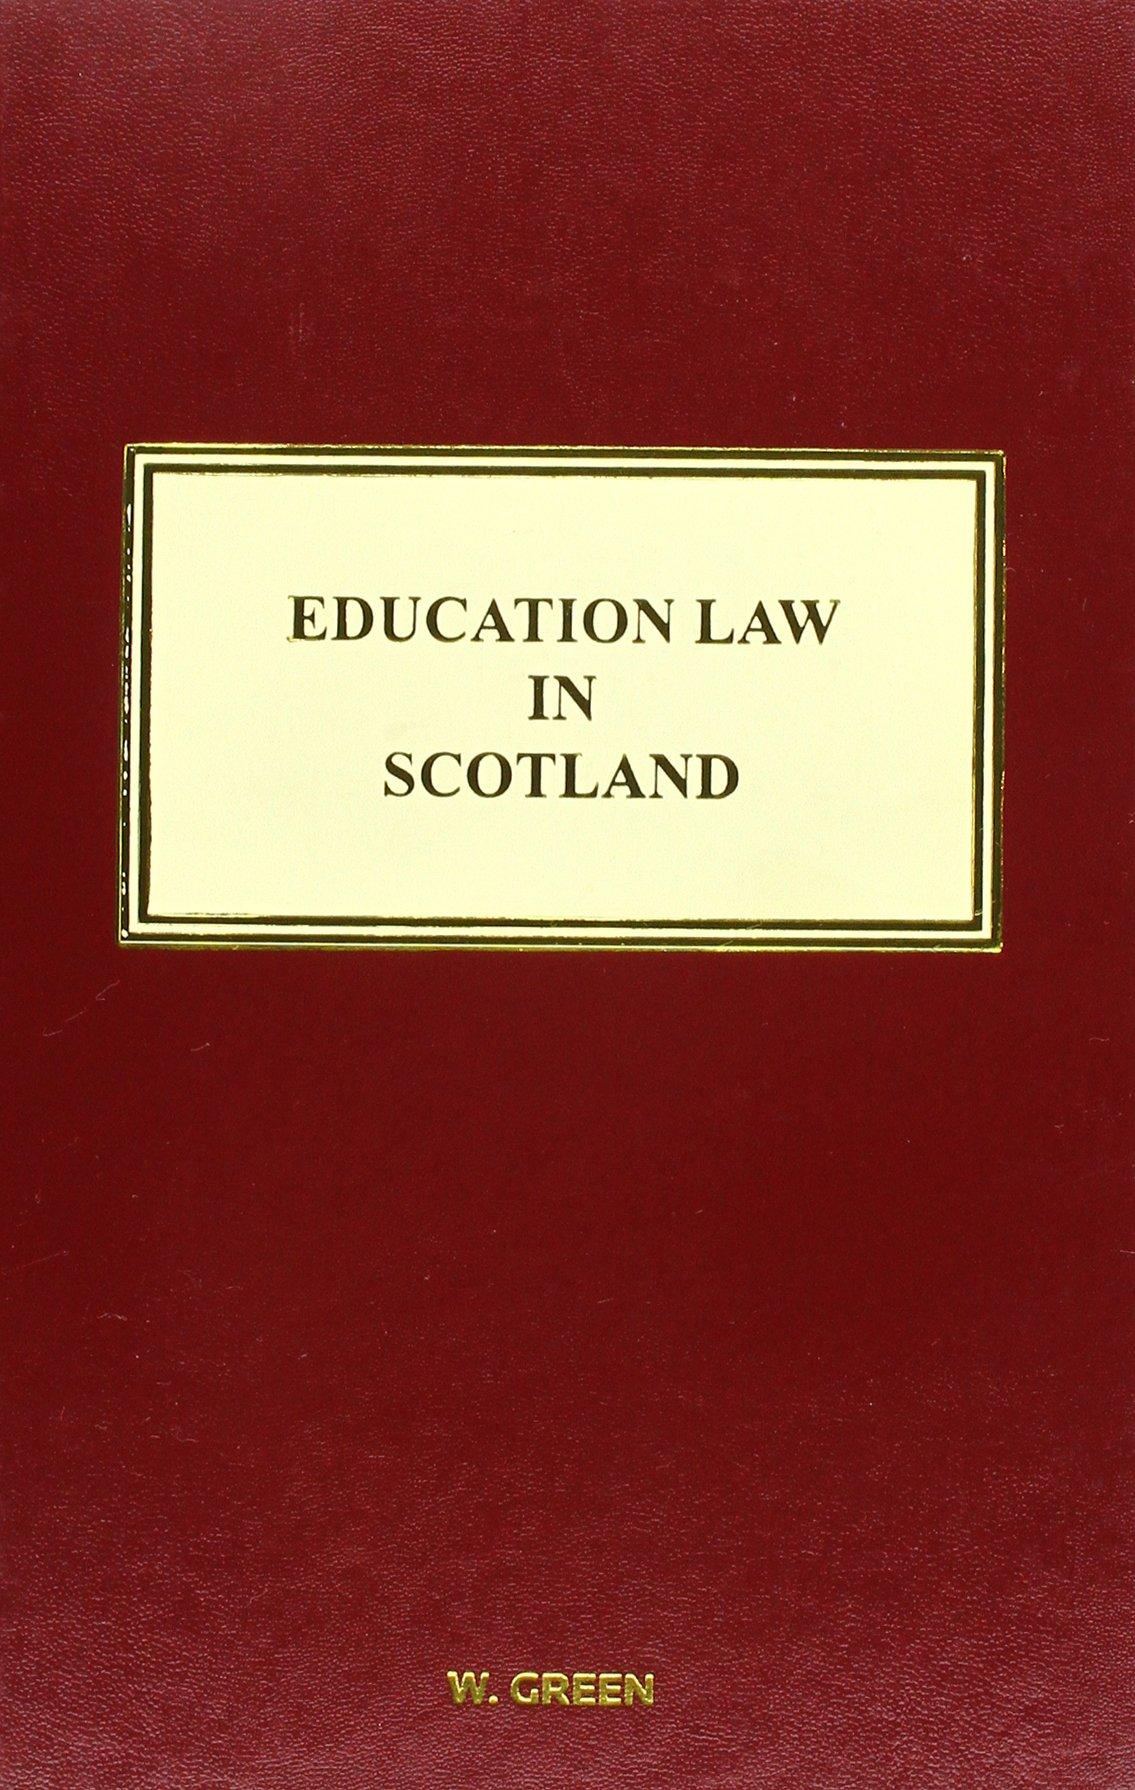 Education Law in Scotland ebook